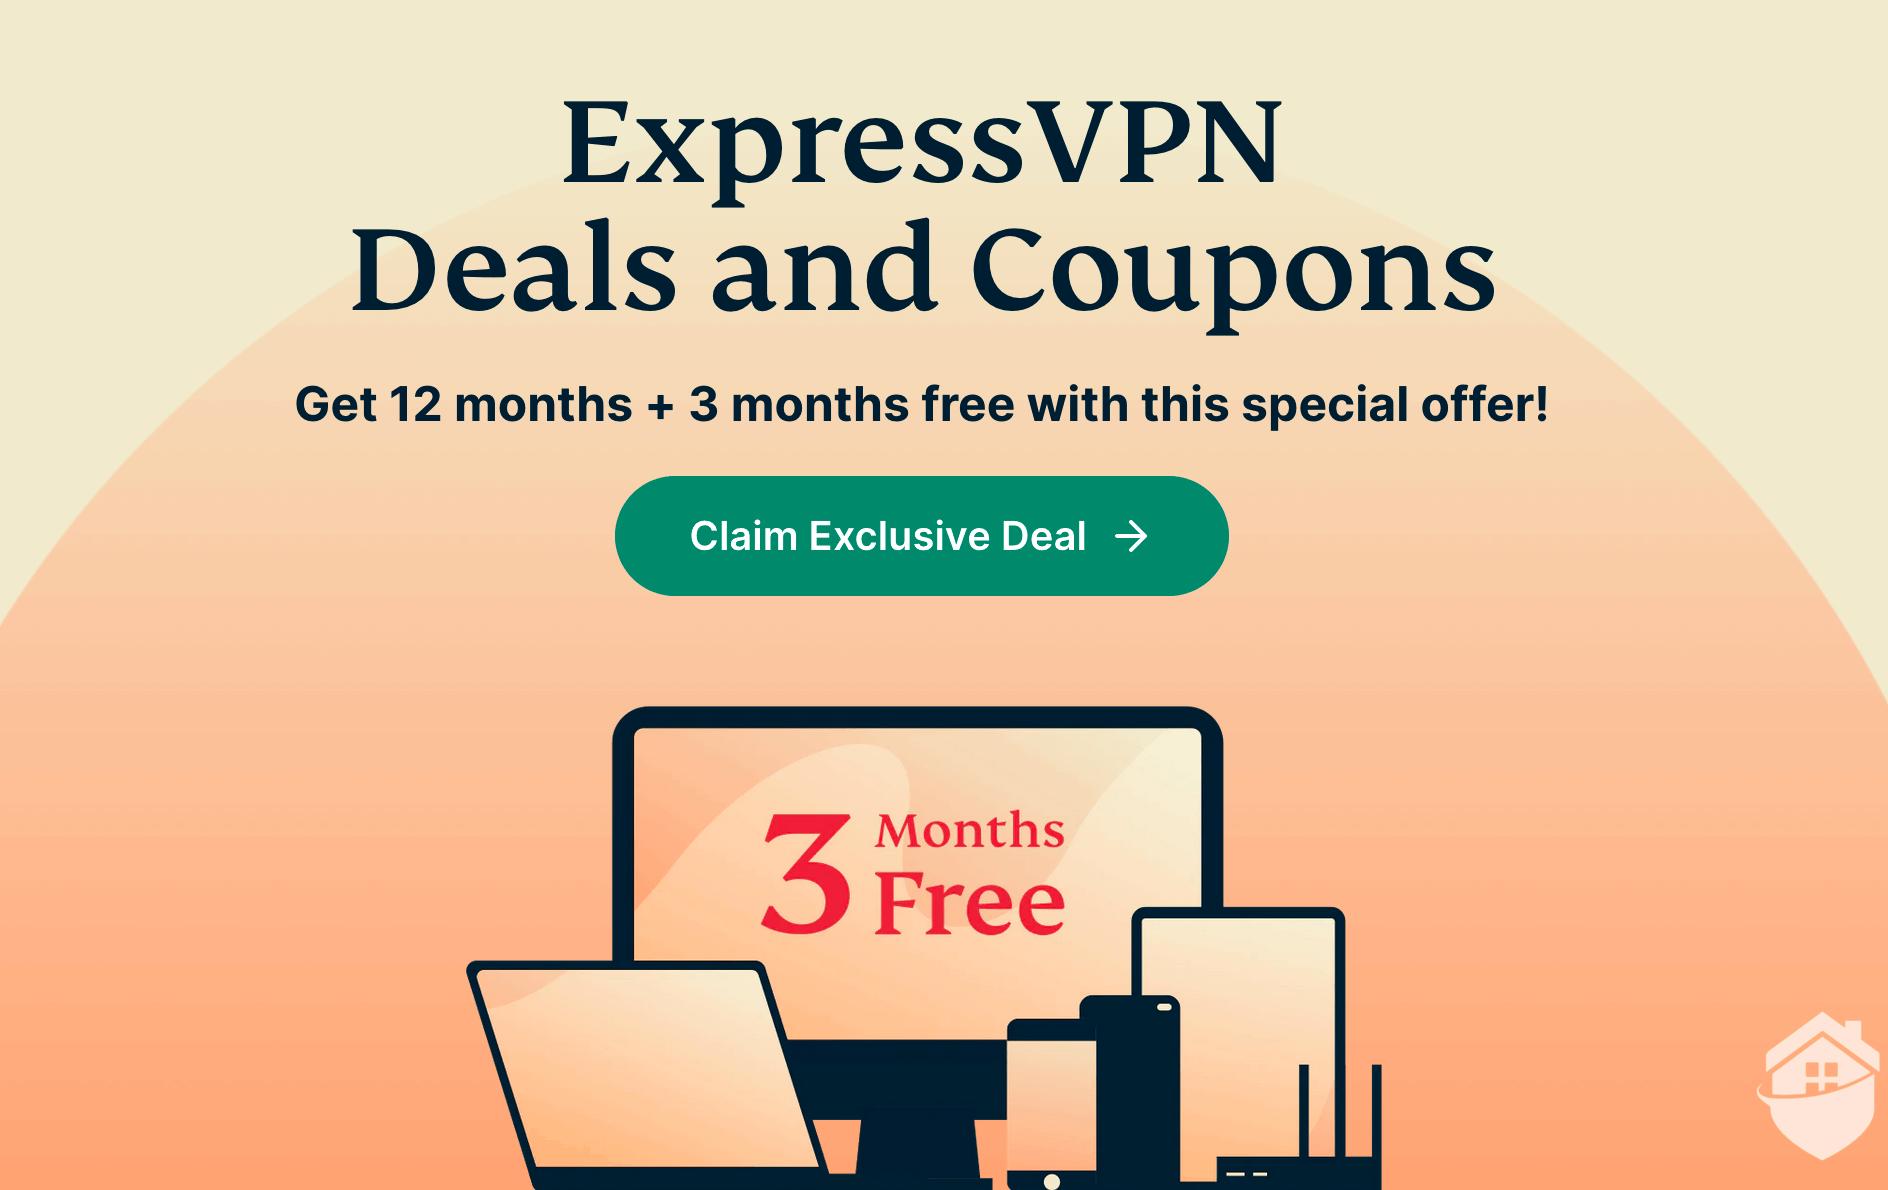 ExpressVPN's sale